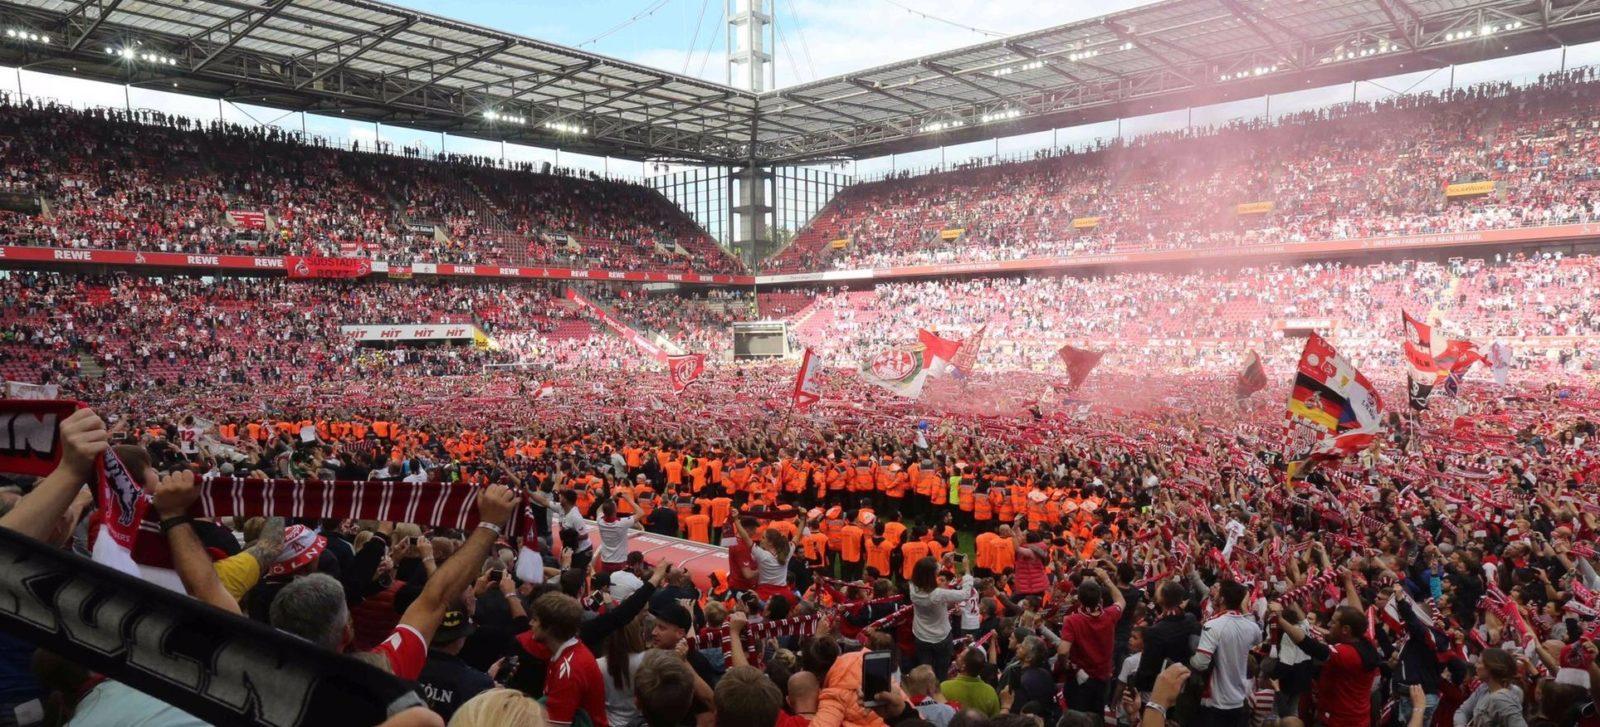 1FC Finale RheinEnergieStadion